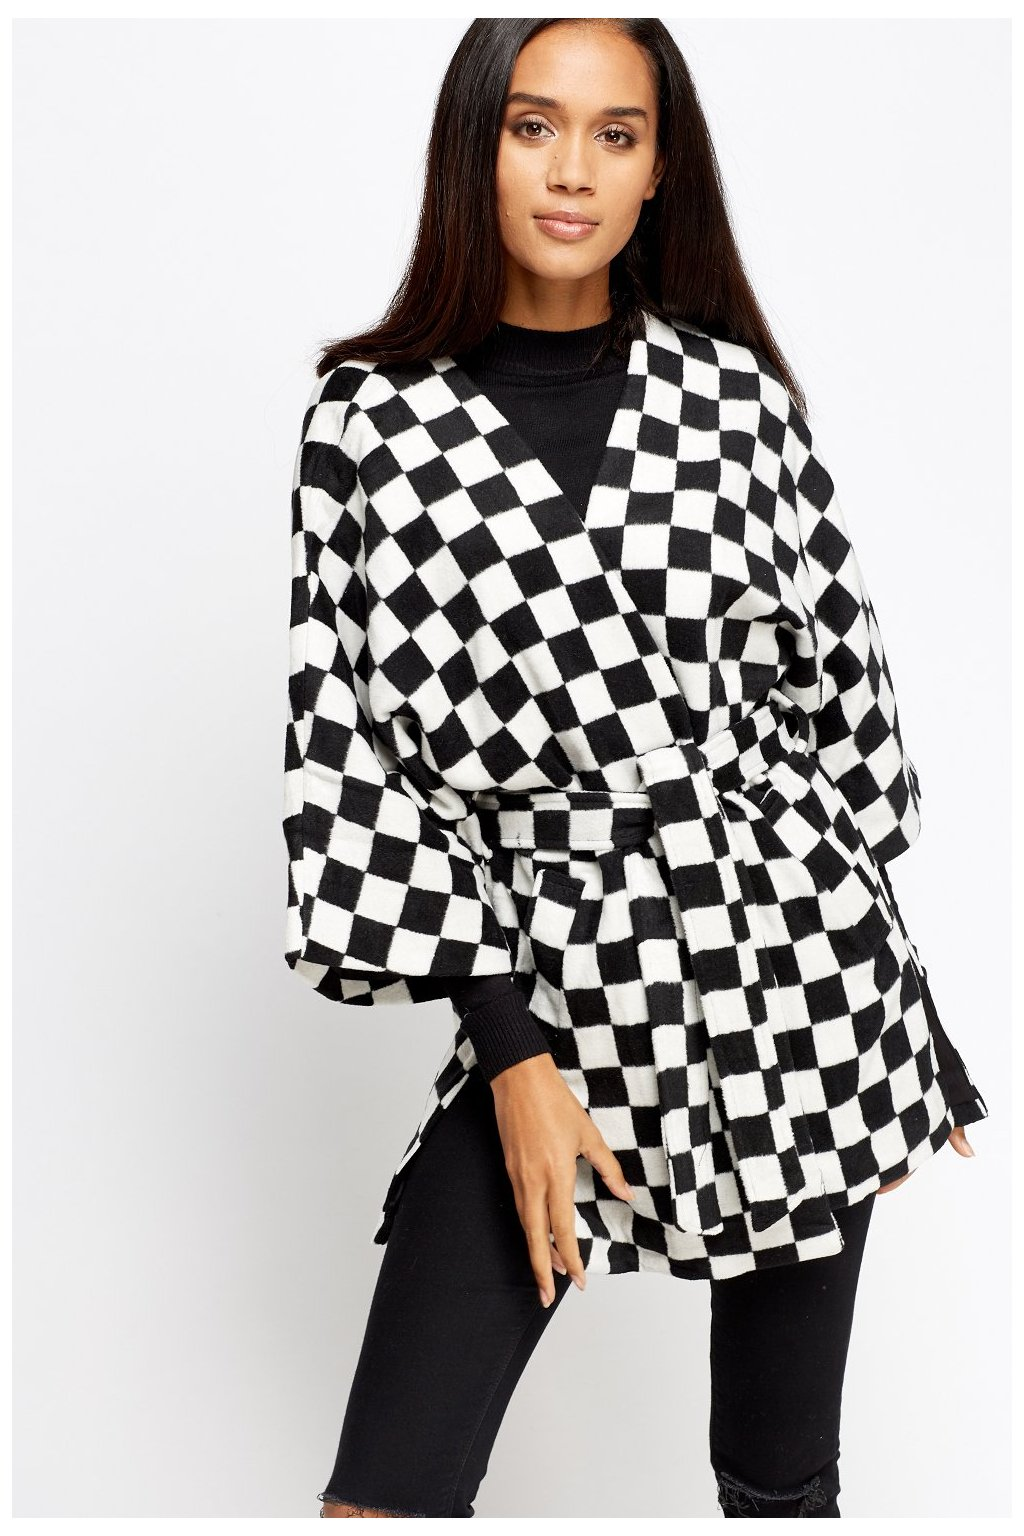 mono grid 3 4 sleeves jacket black white 45486 4